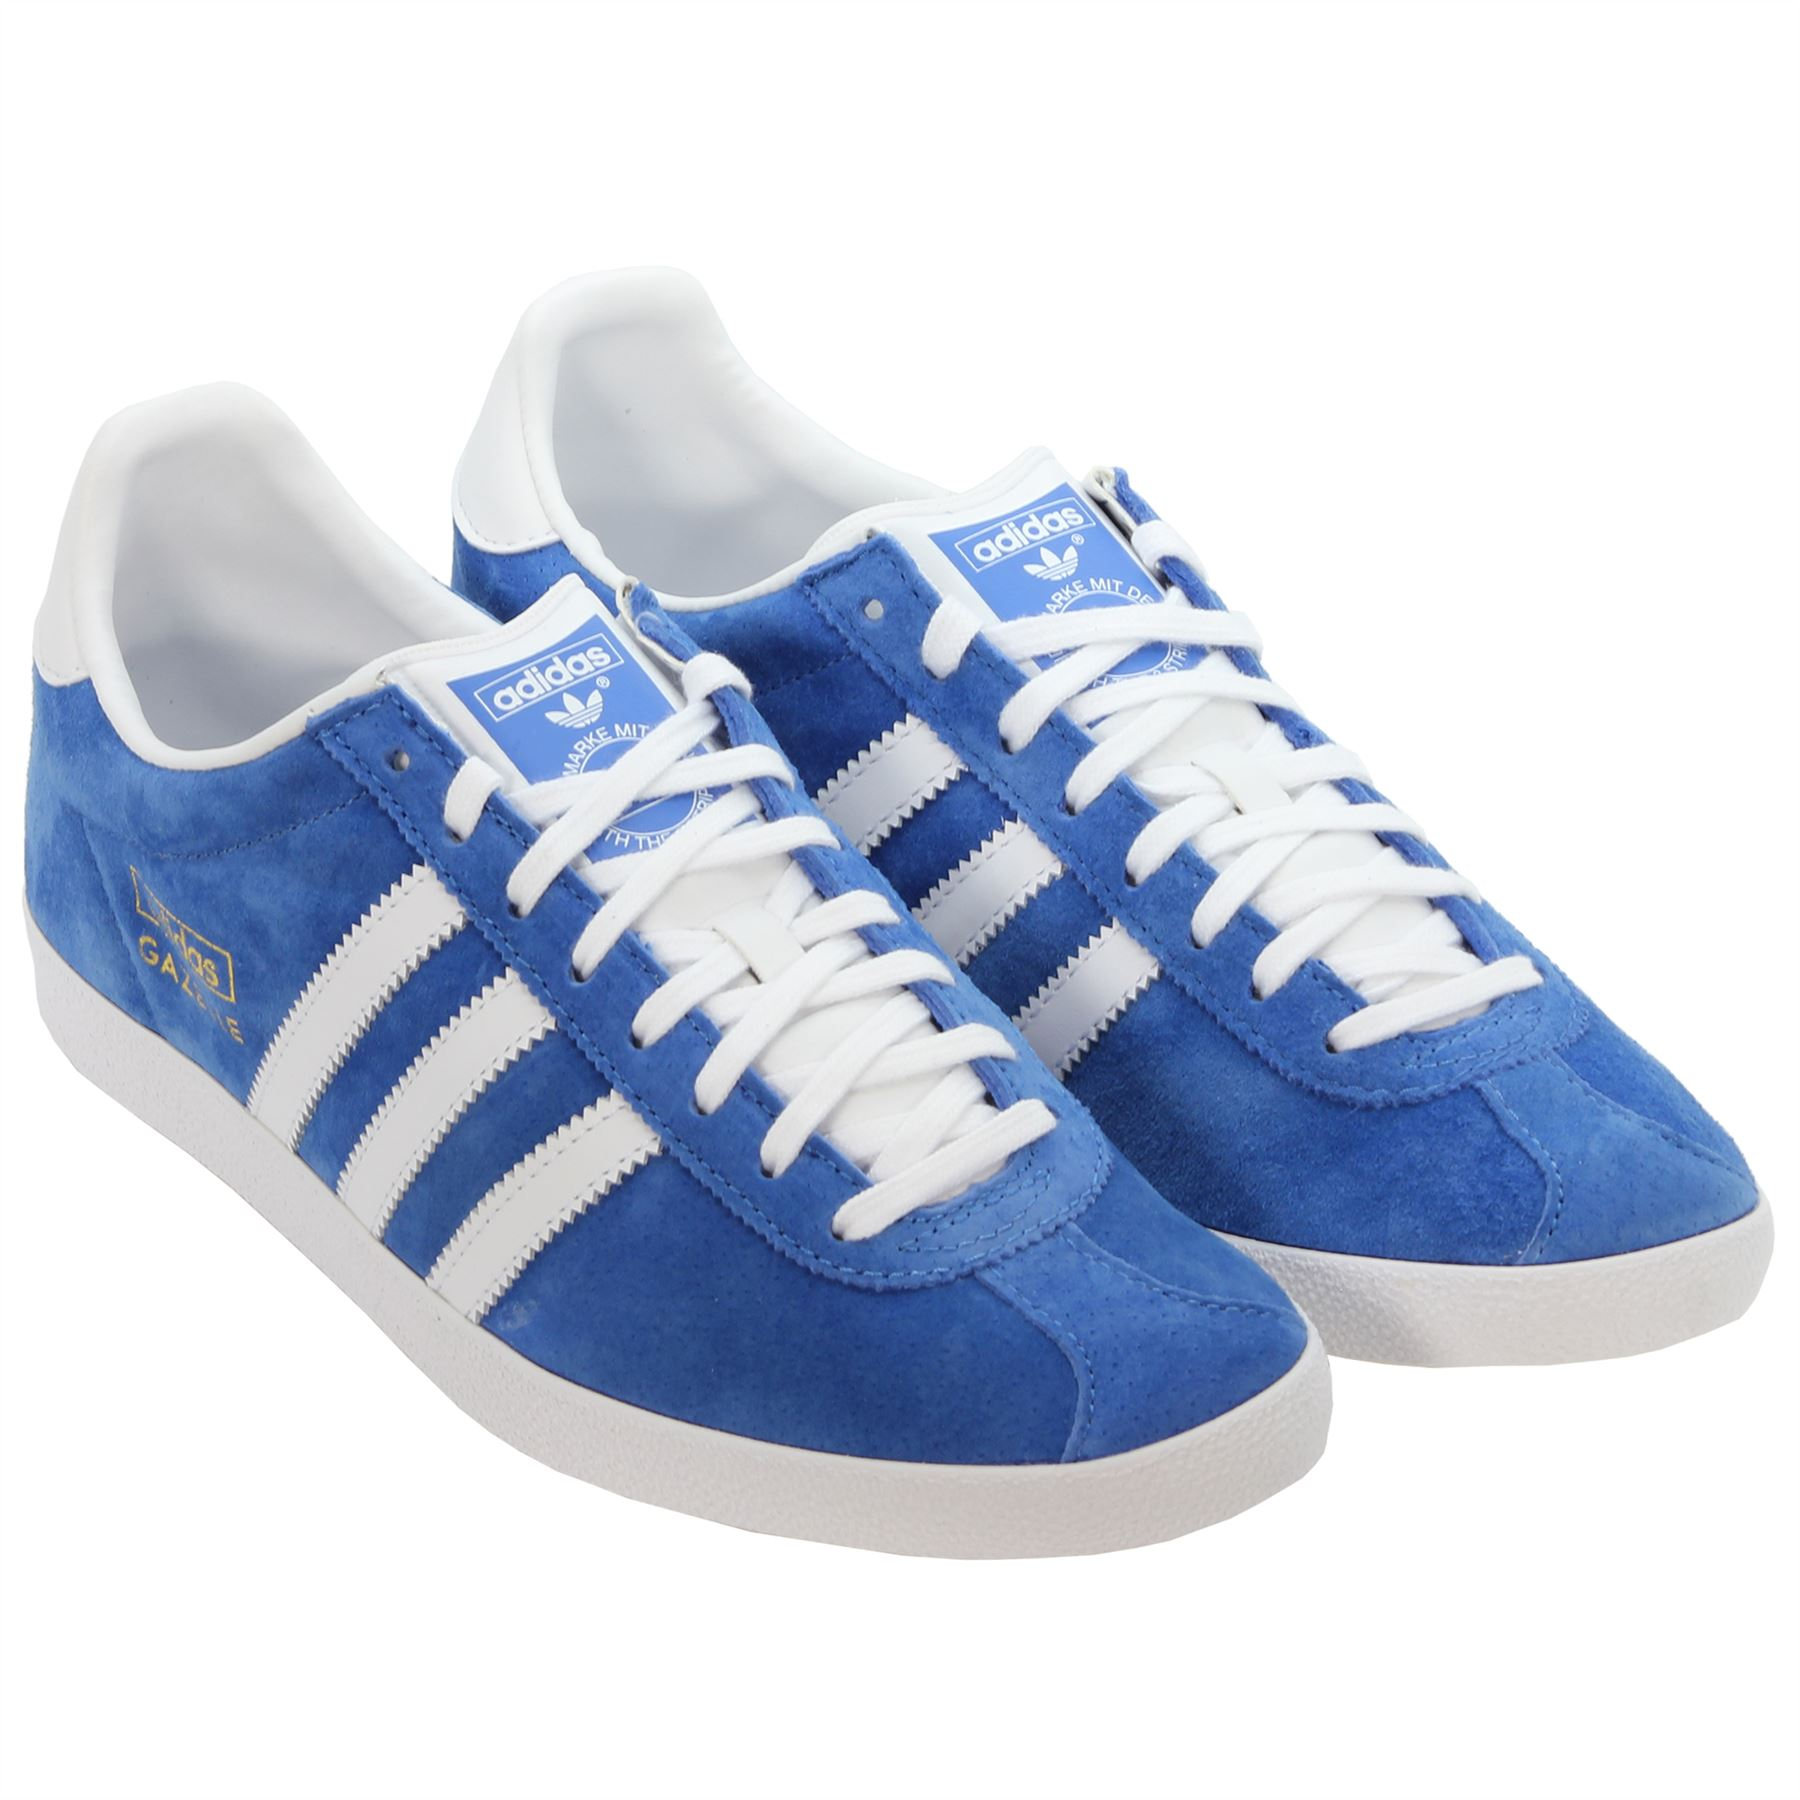 Adidas Gazelle Og Trainers Sneakers Originals Suede Red Blue Black Item Description